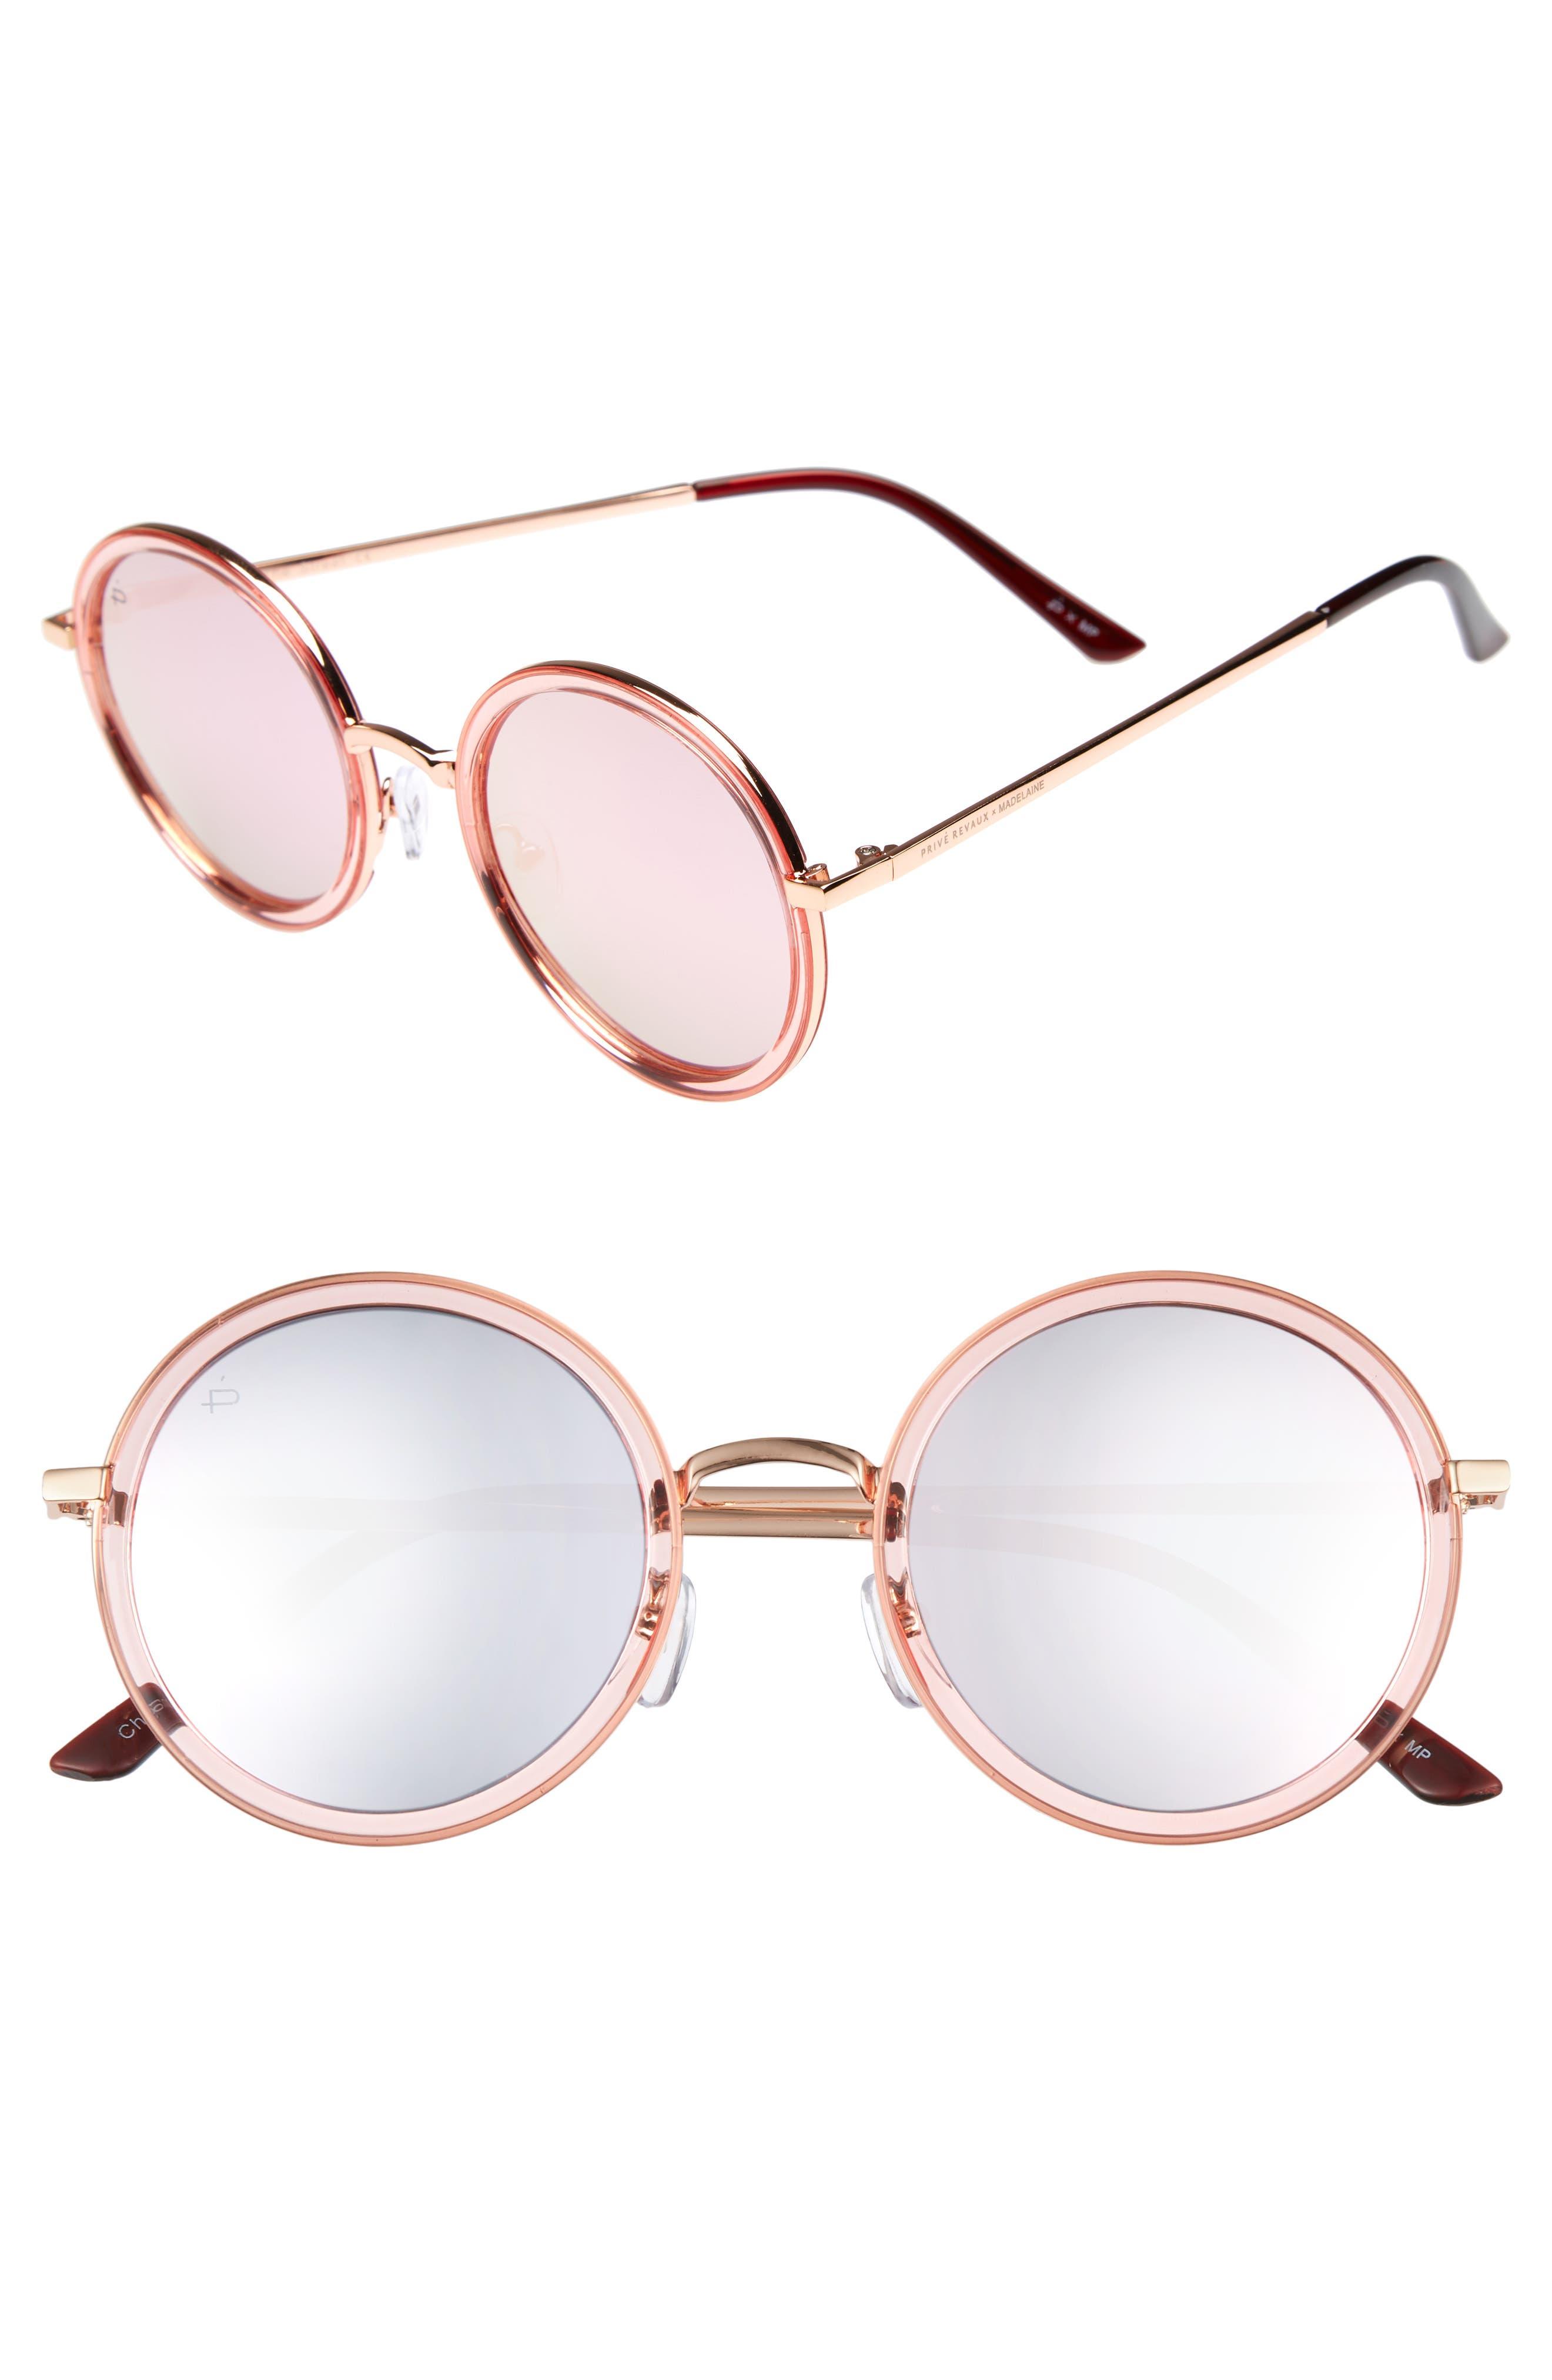 Privé Revaux x Madelaine Petsch The Street 53mm Round Sunglasses,                             Main thumbnail 2, color,